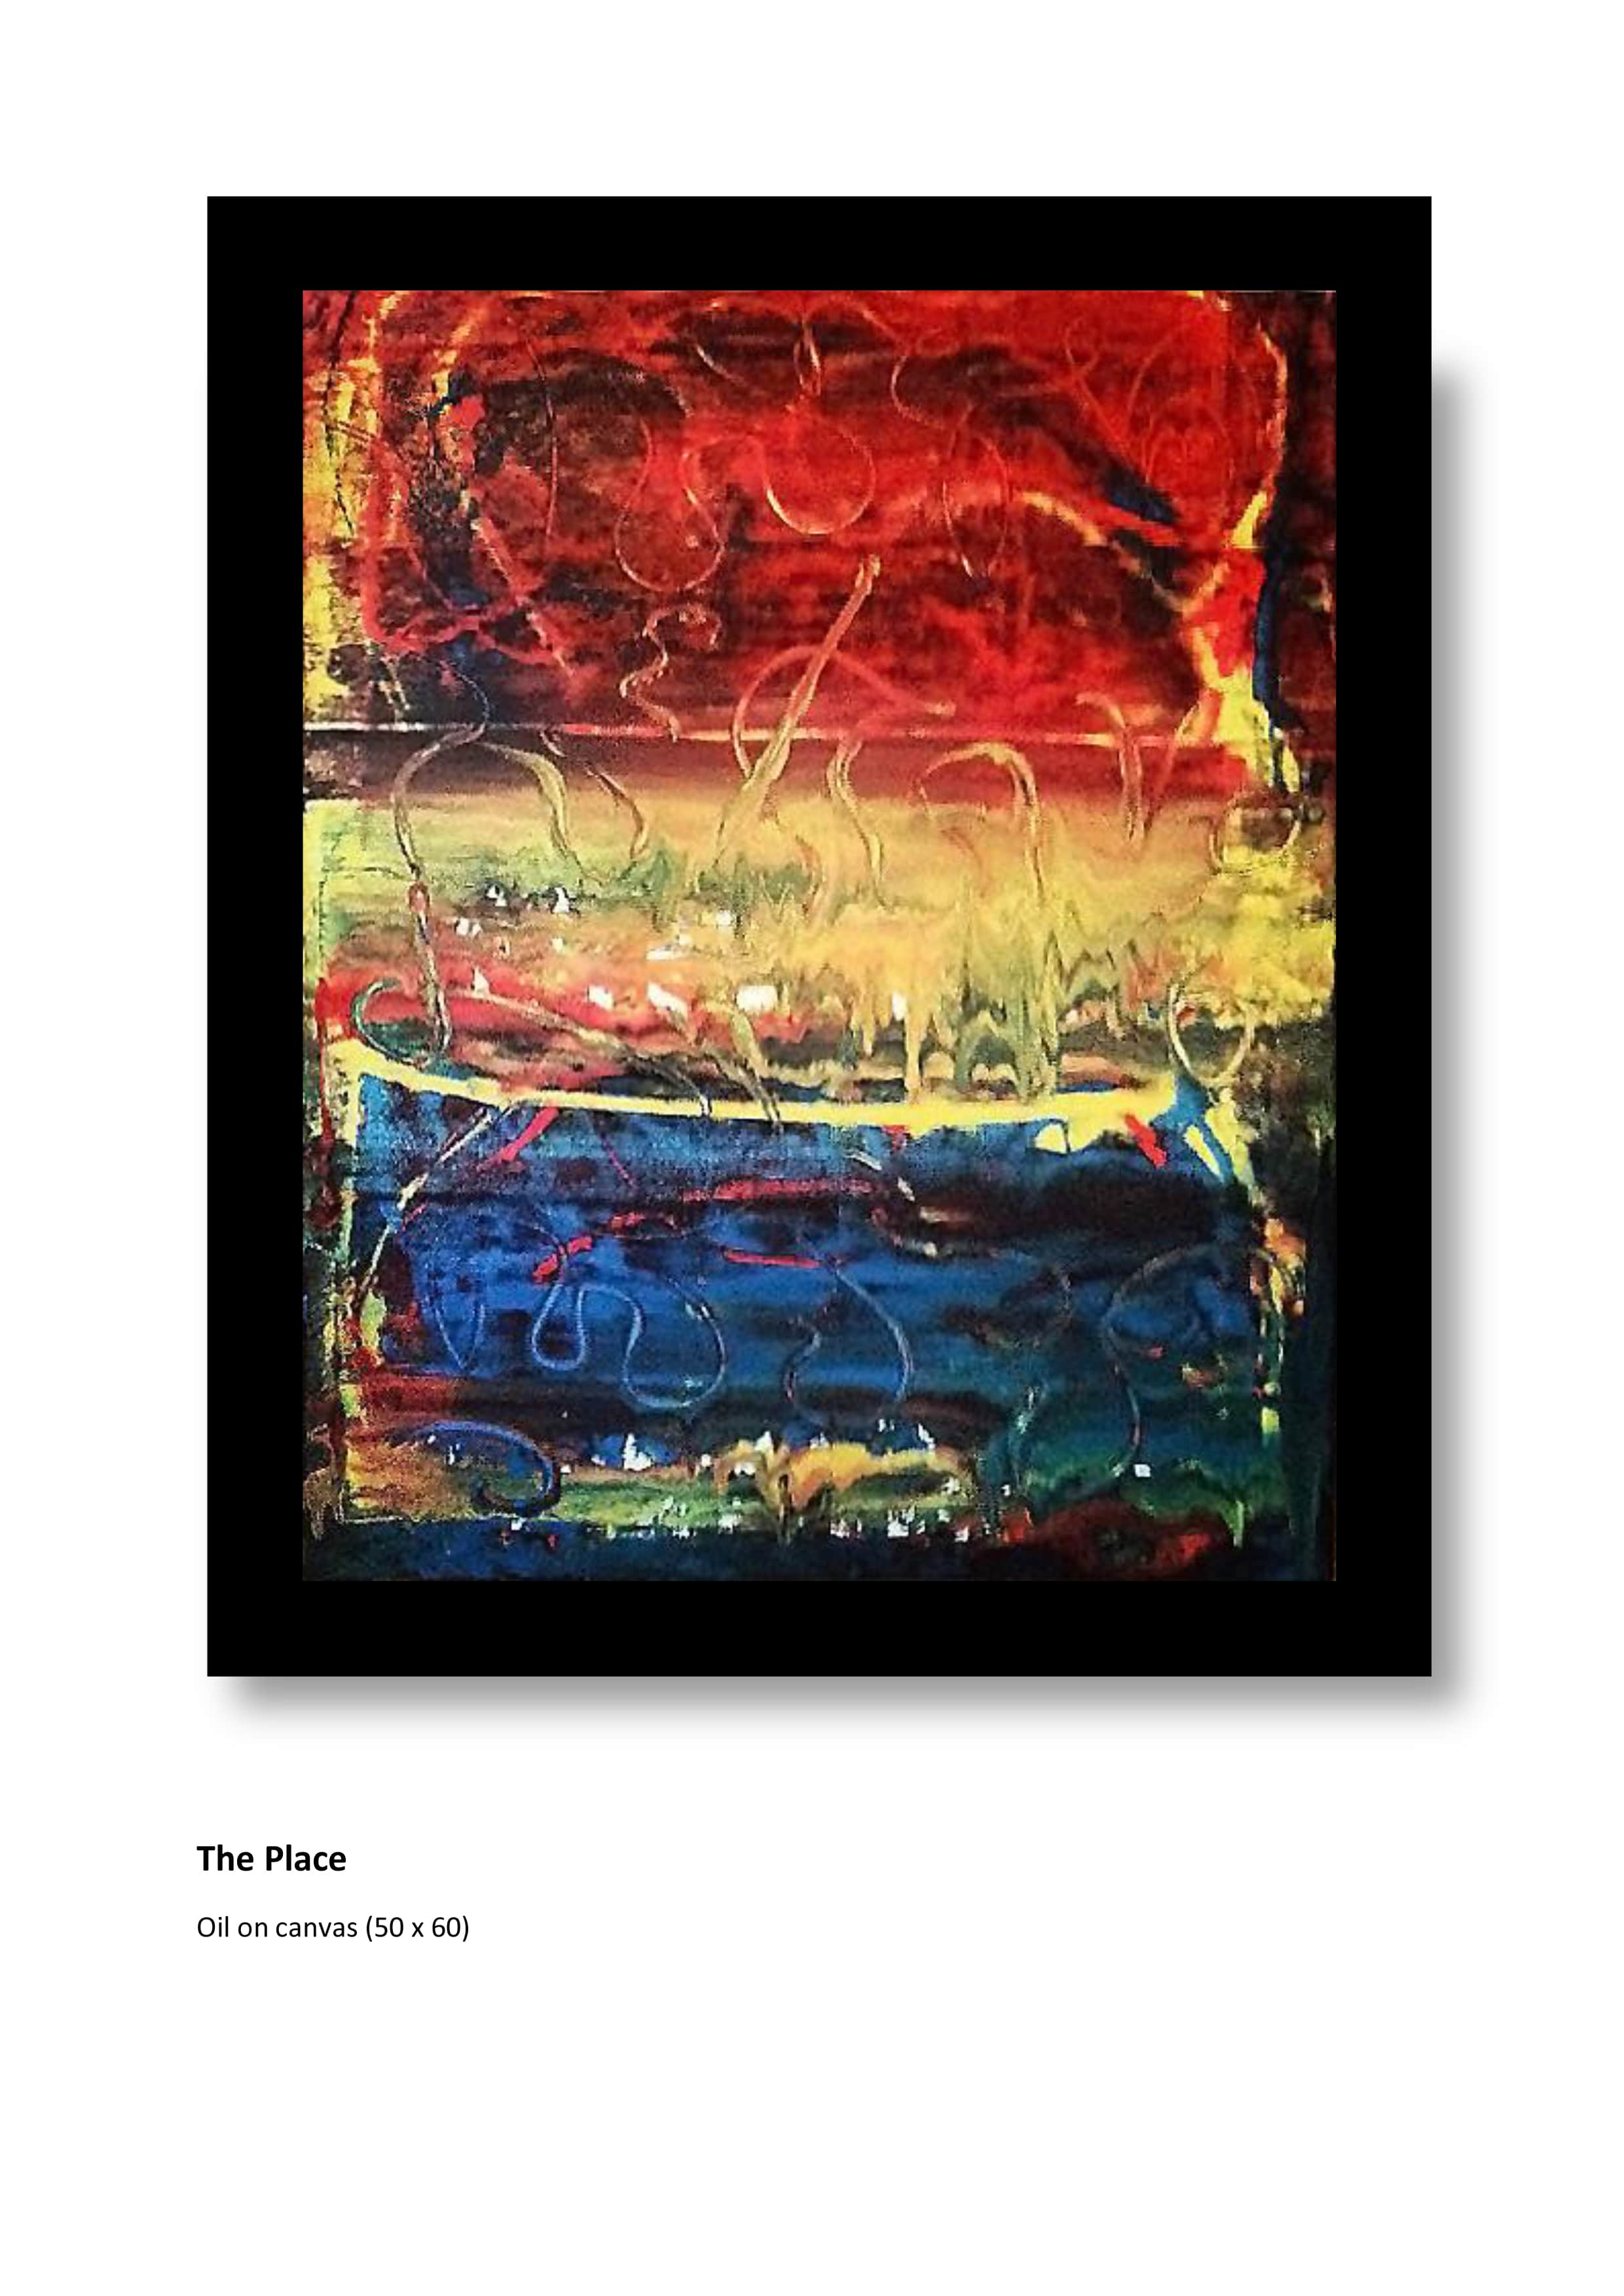 art-portfolio-aglae-corrected-17-min.jpg